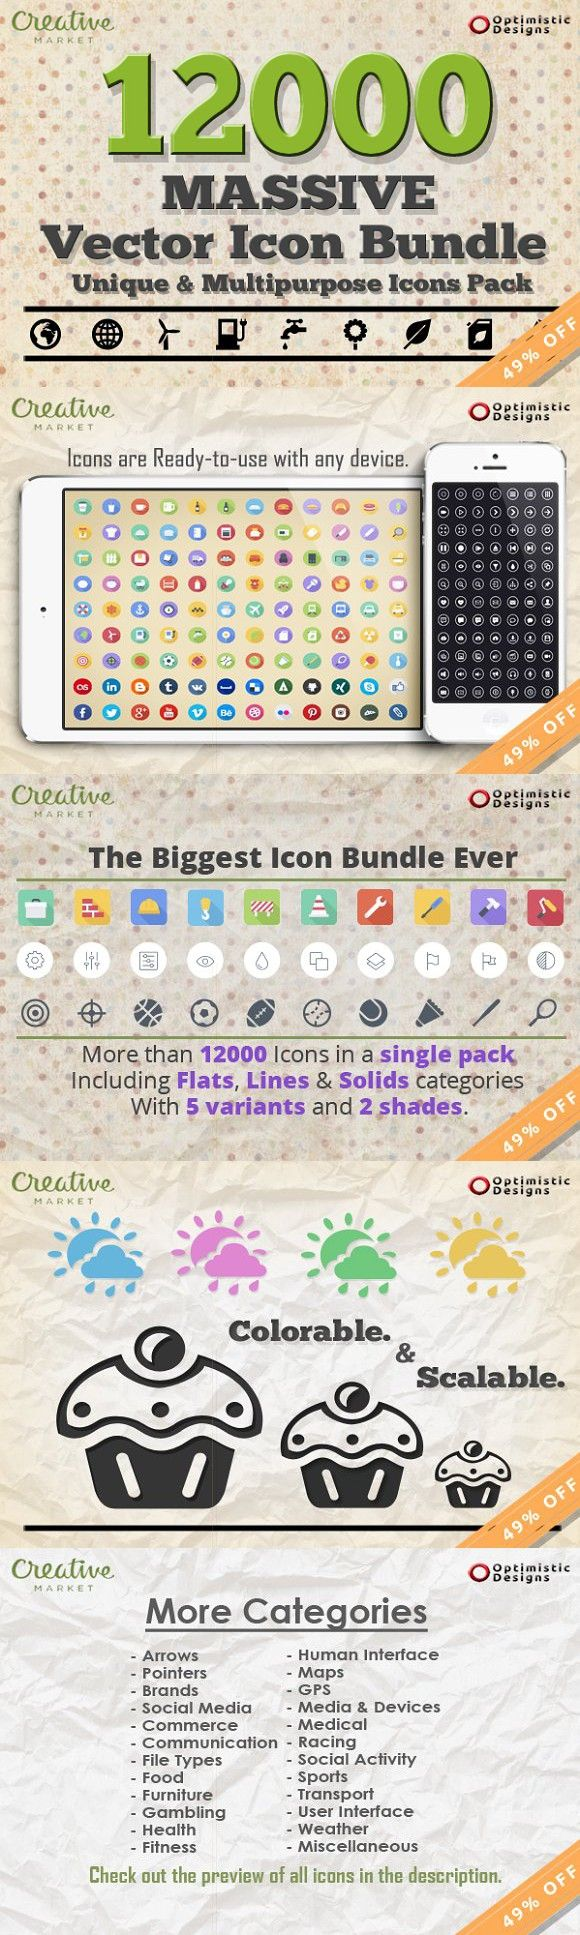 12000 Massive Vector Icons Bundle 1 Joomla templates